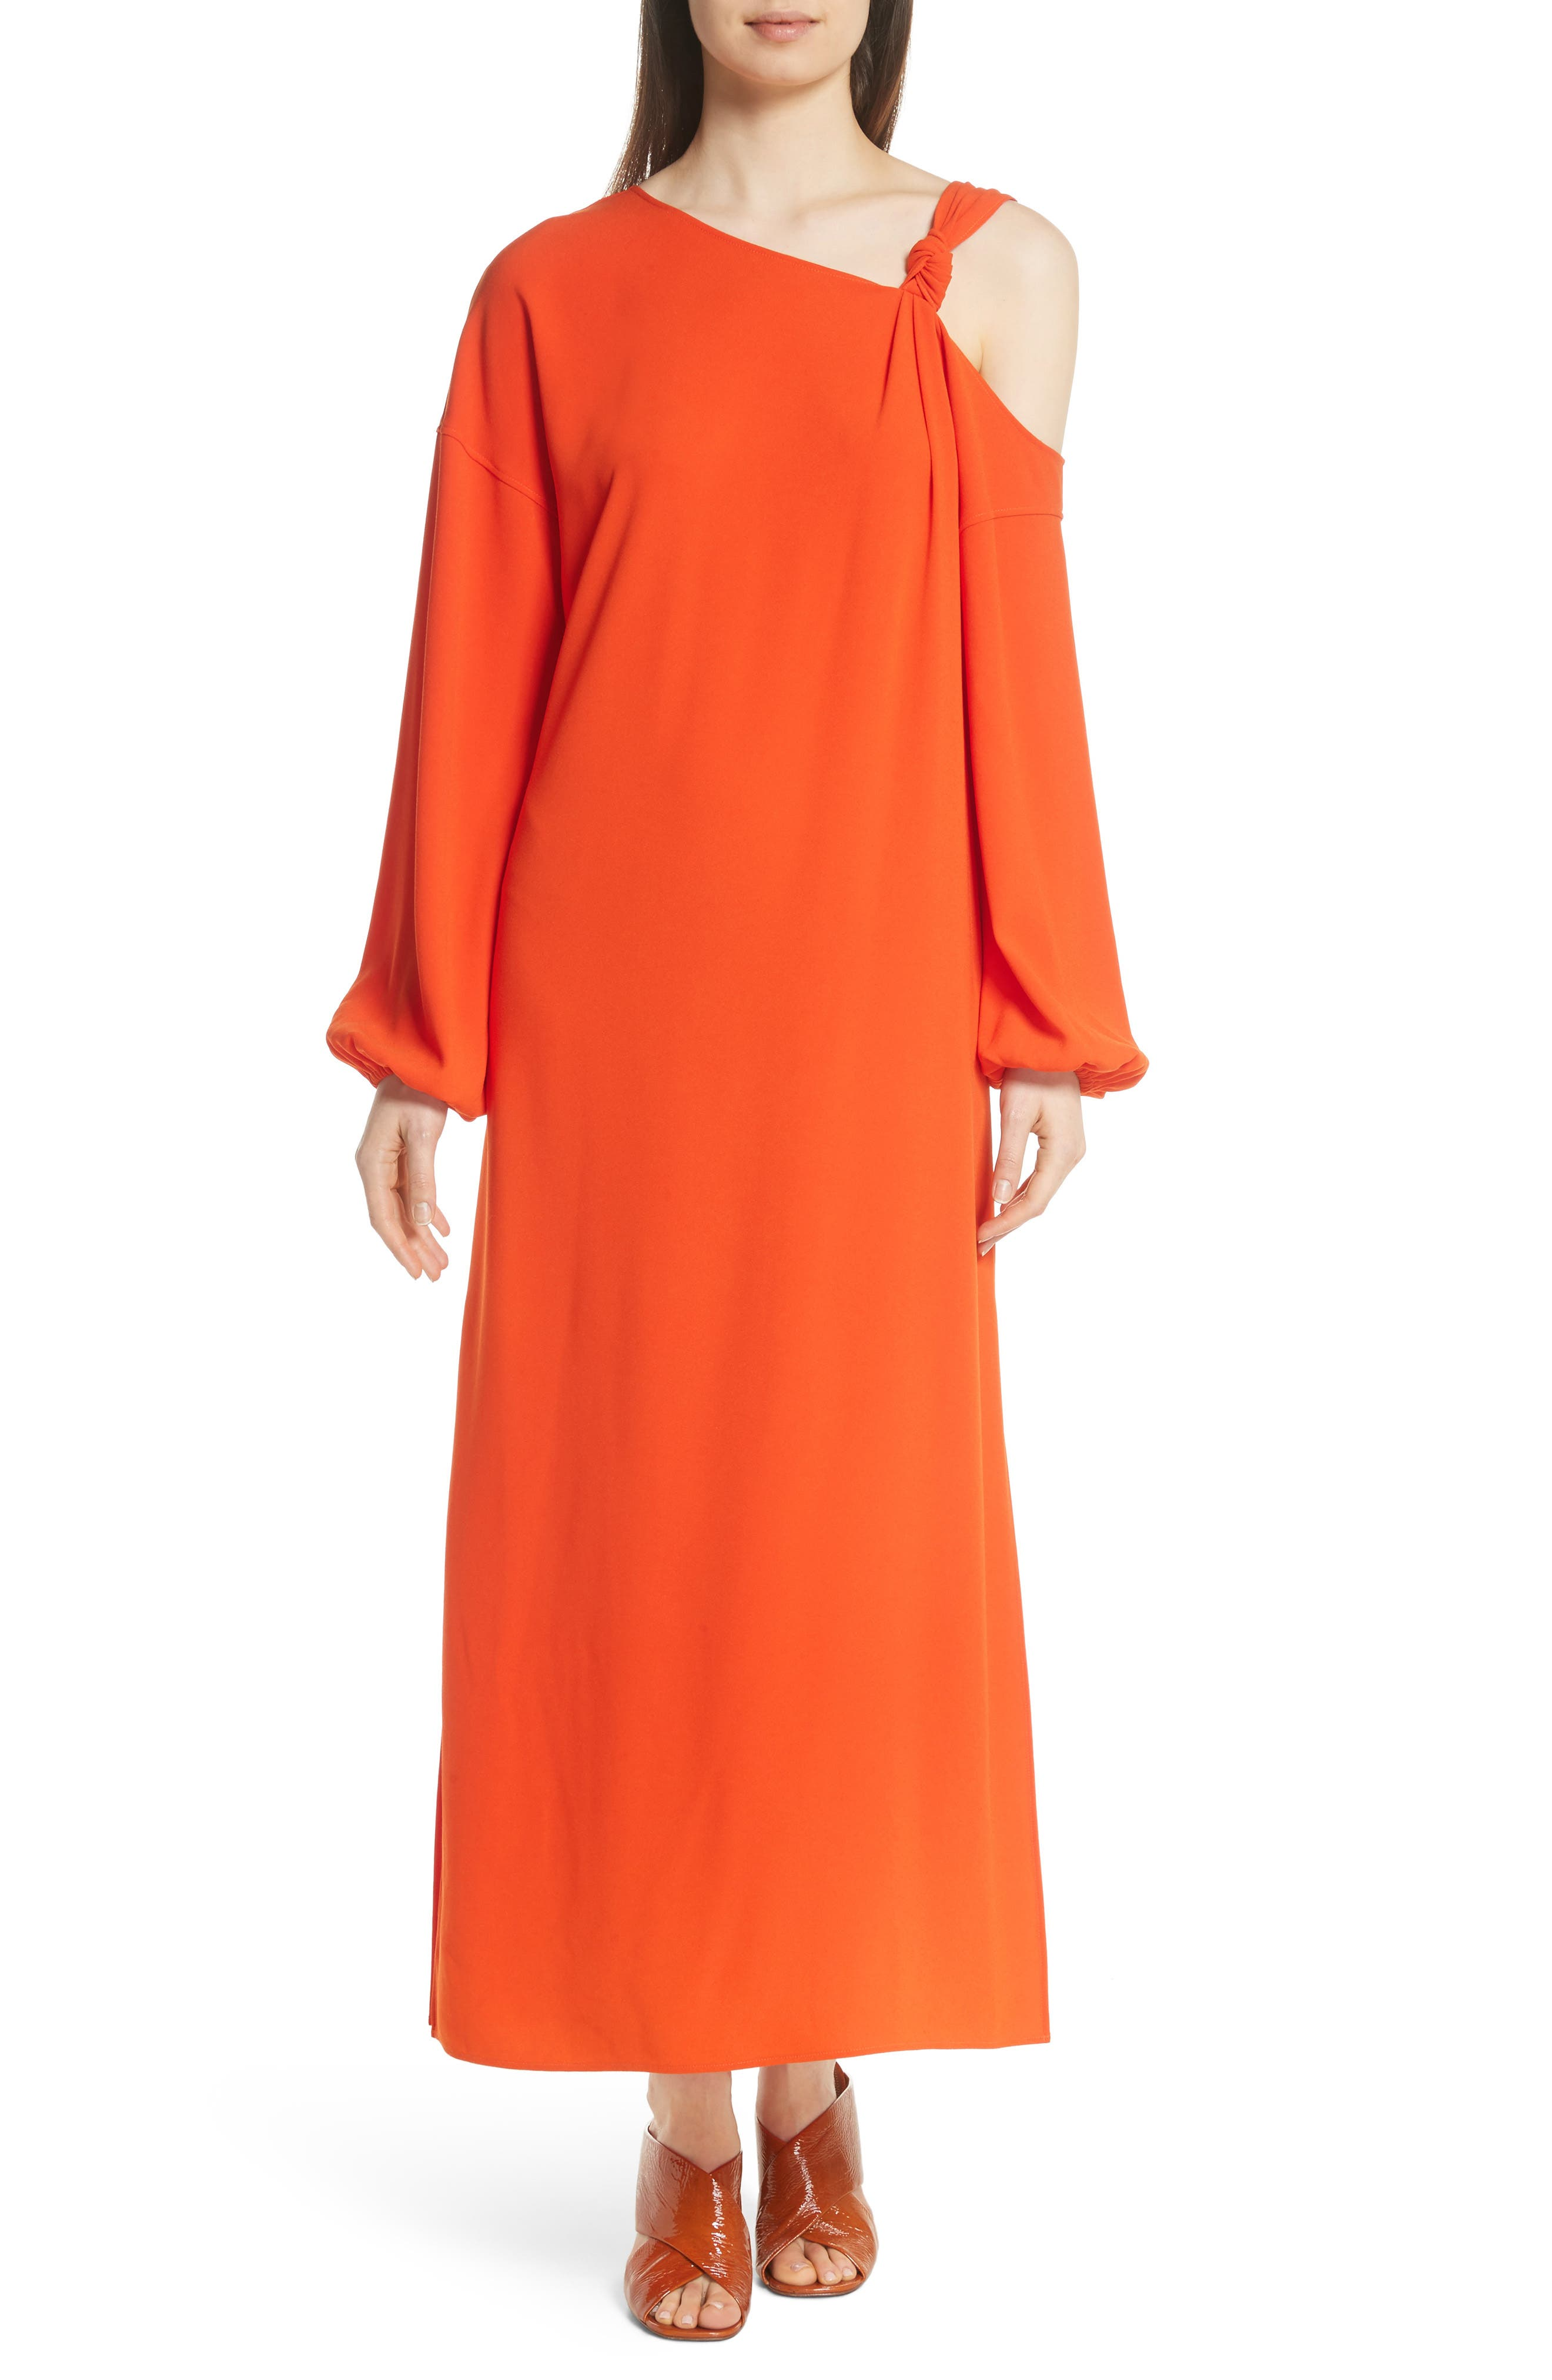 ELIZABETH AND JAMES Shontae One-Shoulder Maxi Dress, Main, color, 807